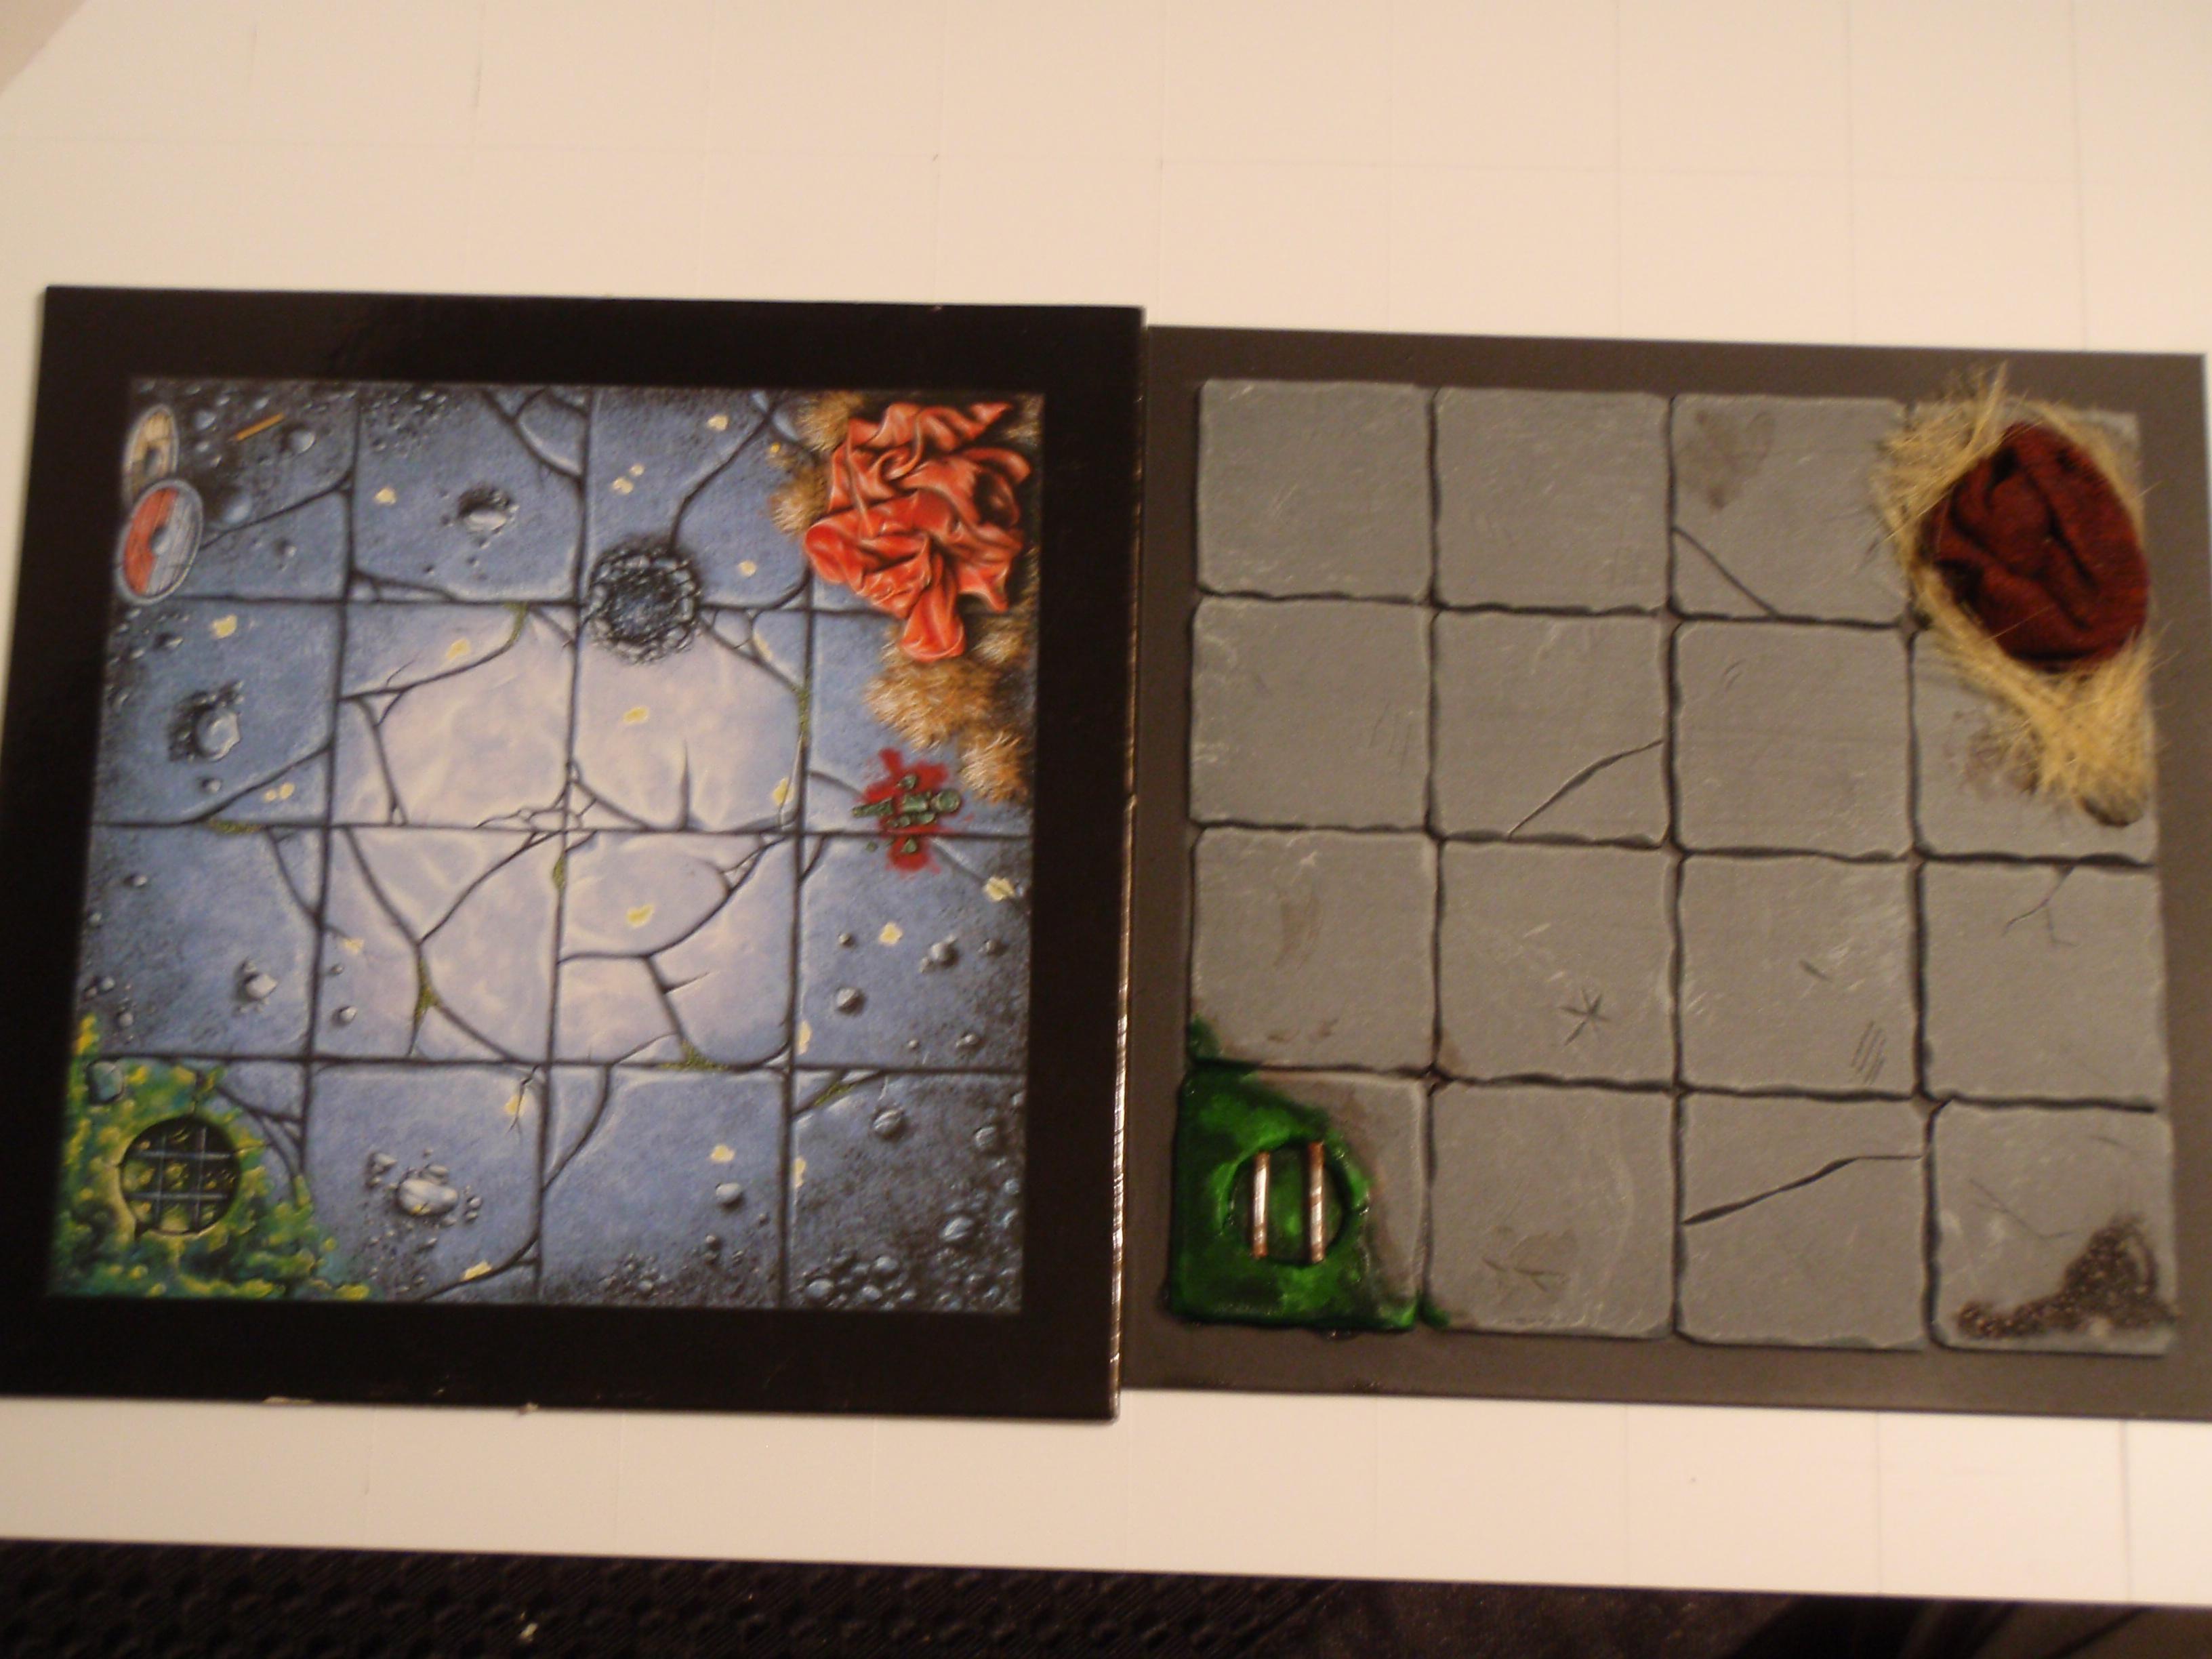 Comparison with the original card tile